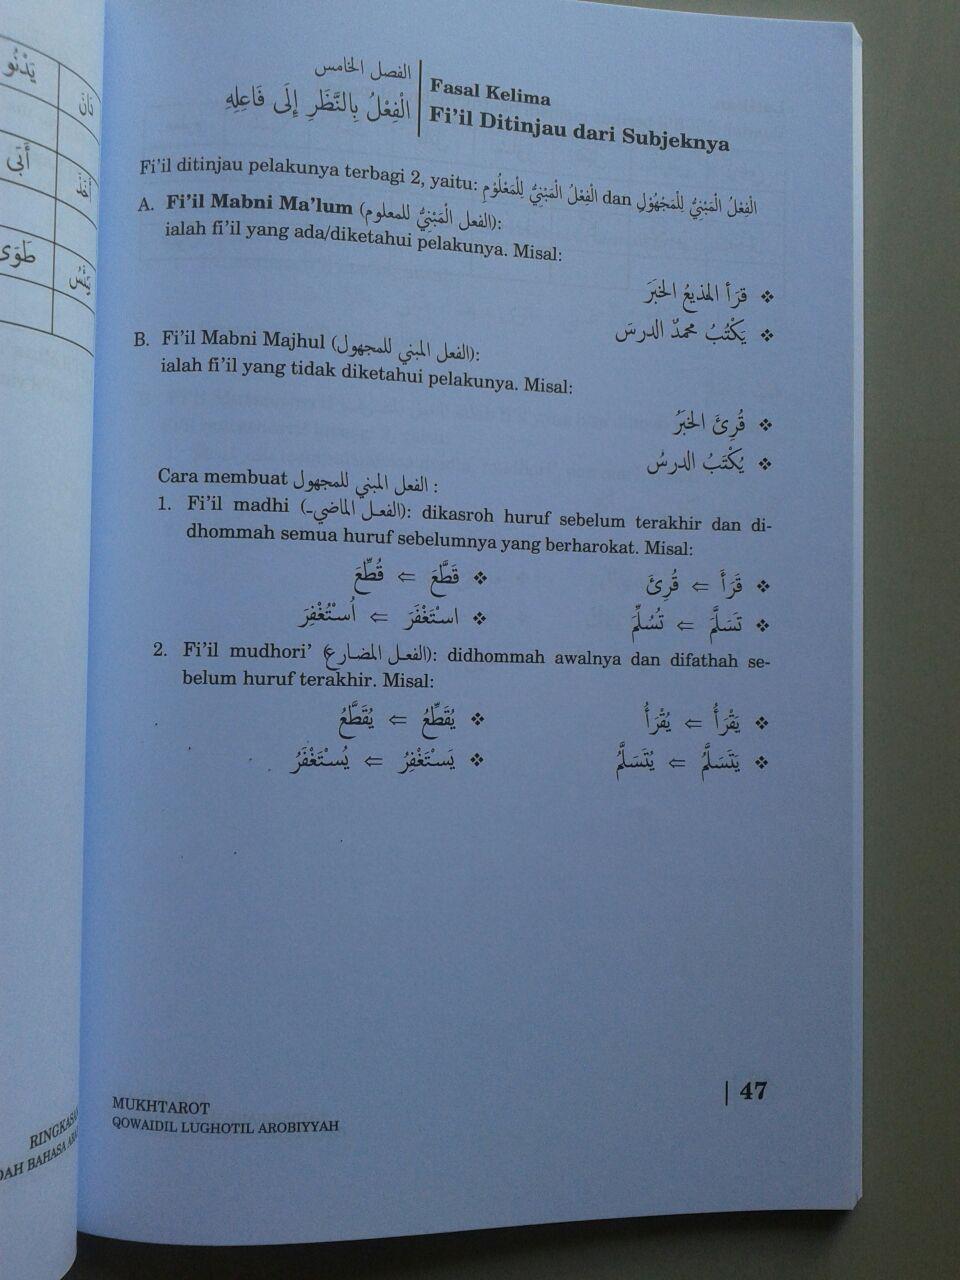 Buku Mukhtarot Ringkasan Kaidah Bahasa Arab isi 2